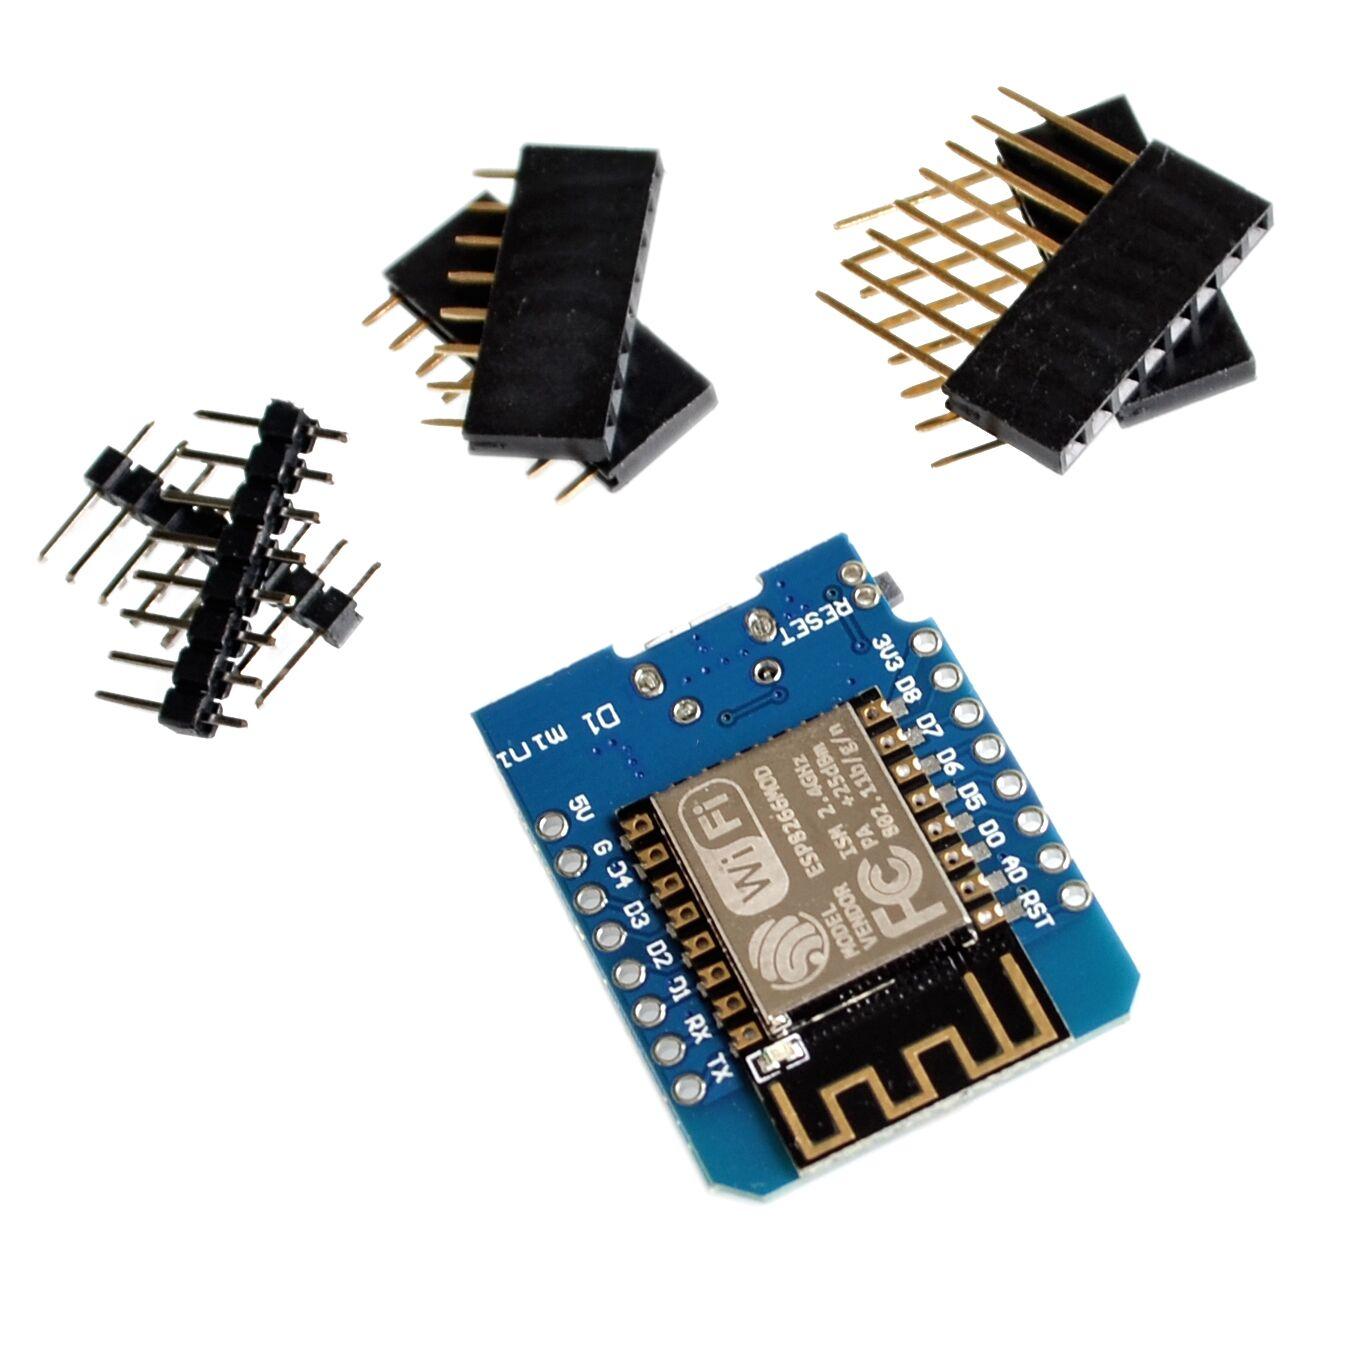 ESP8266 ESP-12 NodeMcu Lua WeMos D1 WIFI Mini CH340G Development Board Antenna M